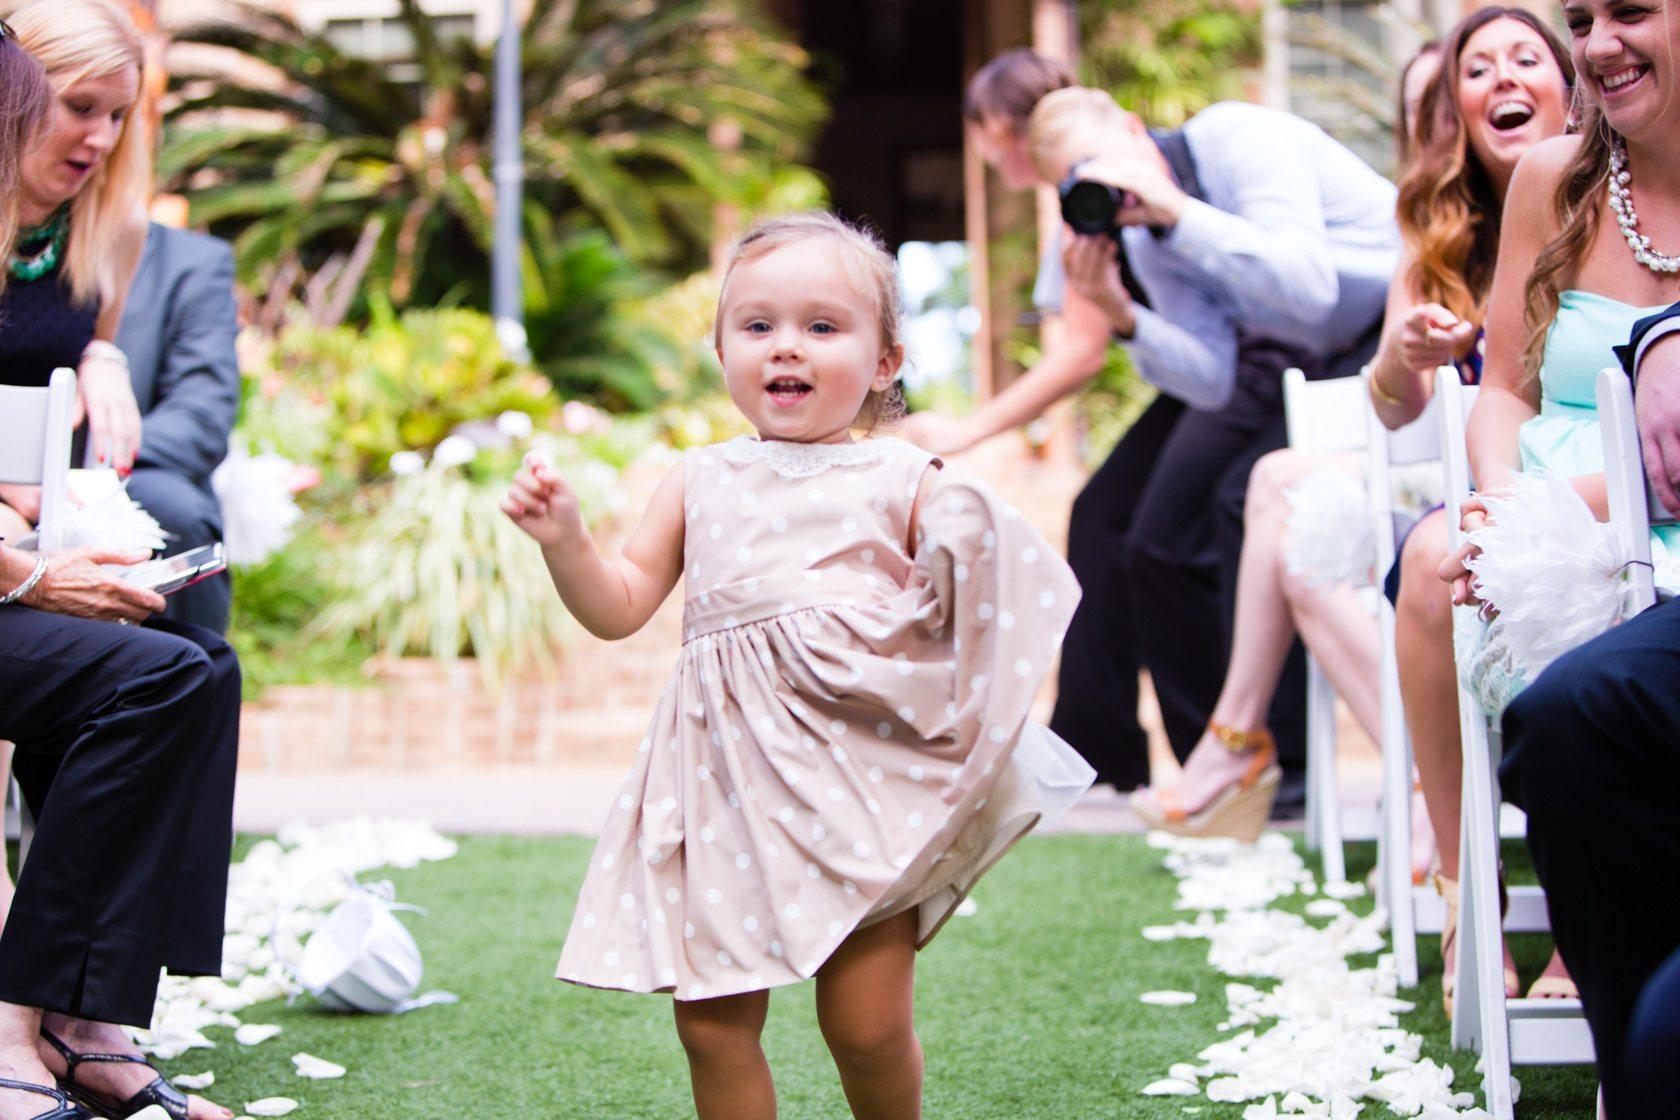 San_Diego_Botanic_Gardens_Wedding_027.jpg